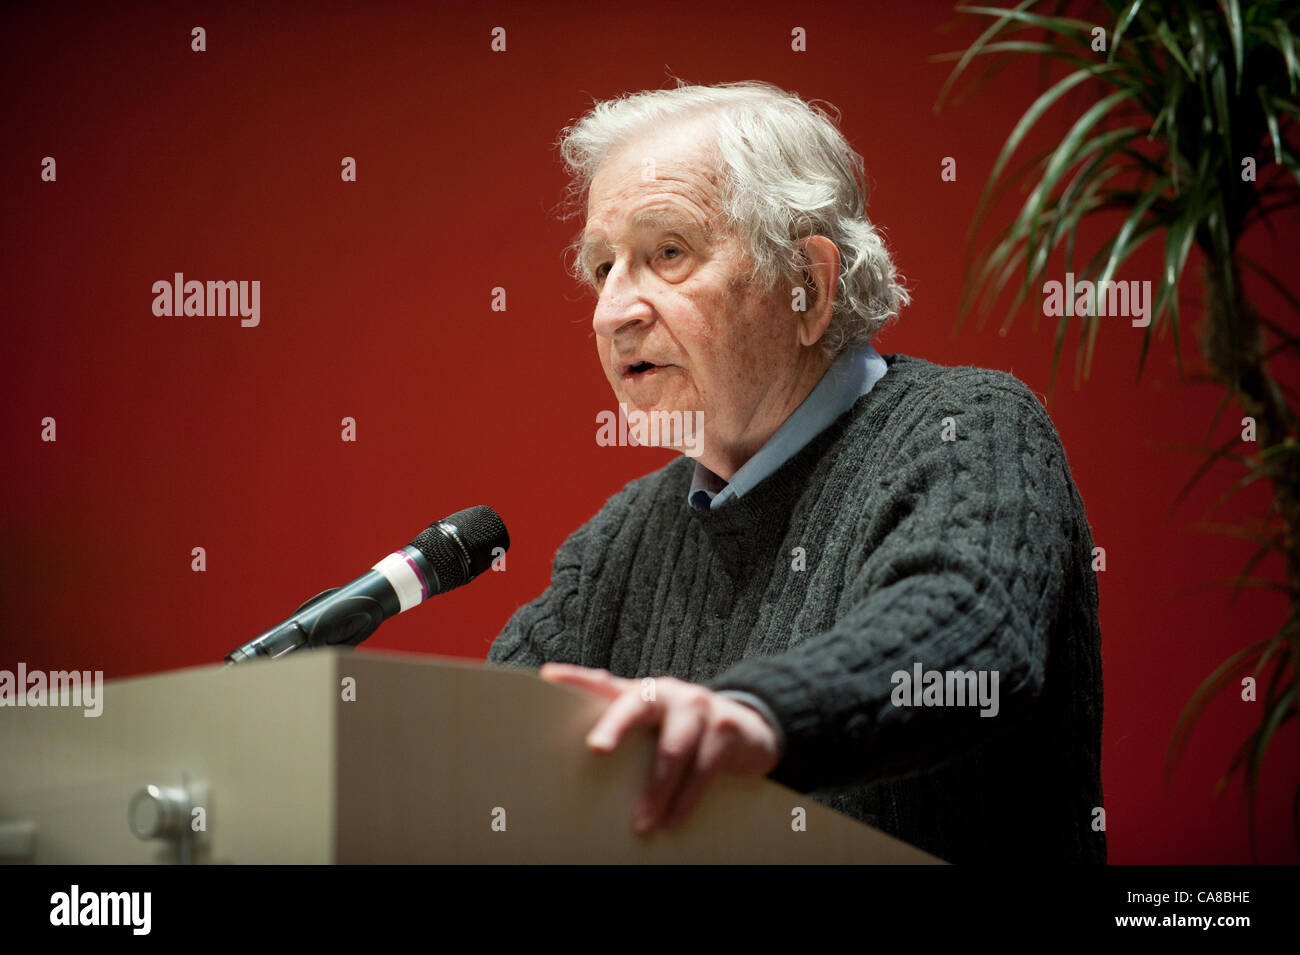 Feb. 7, 2012 - Tucson, Arizona, United States - Author, social scientist and linguist Noam Chomsky addressed approximatly - Stock Image